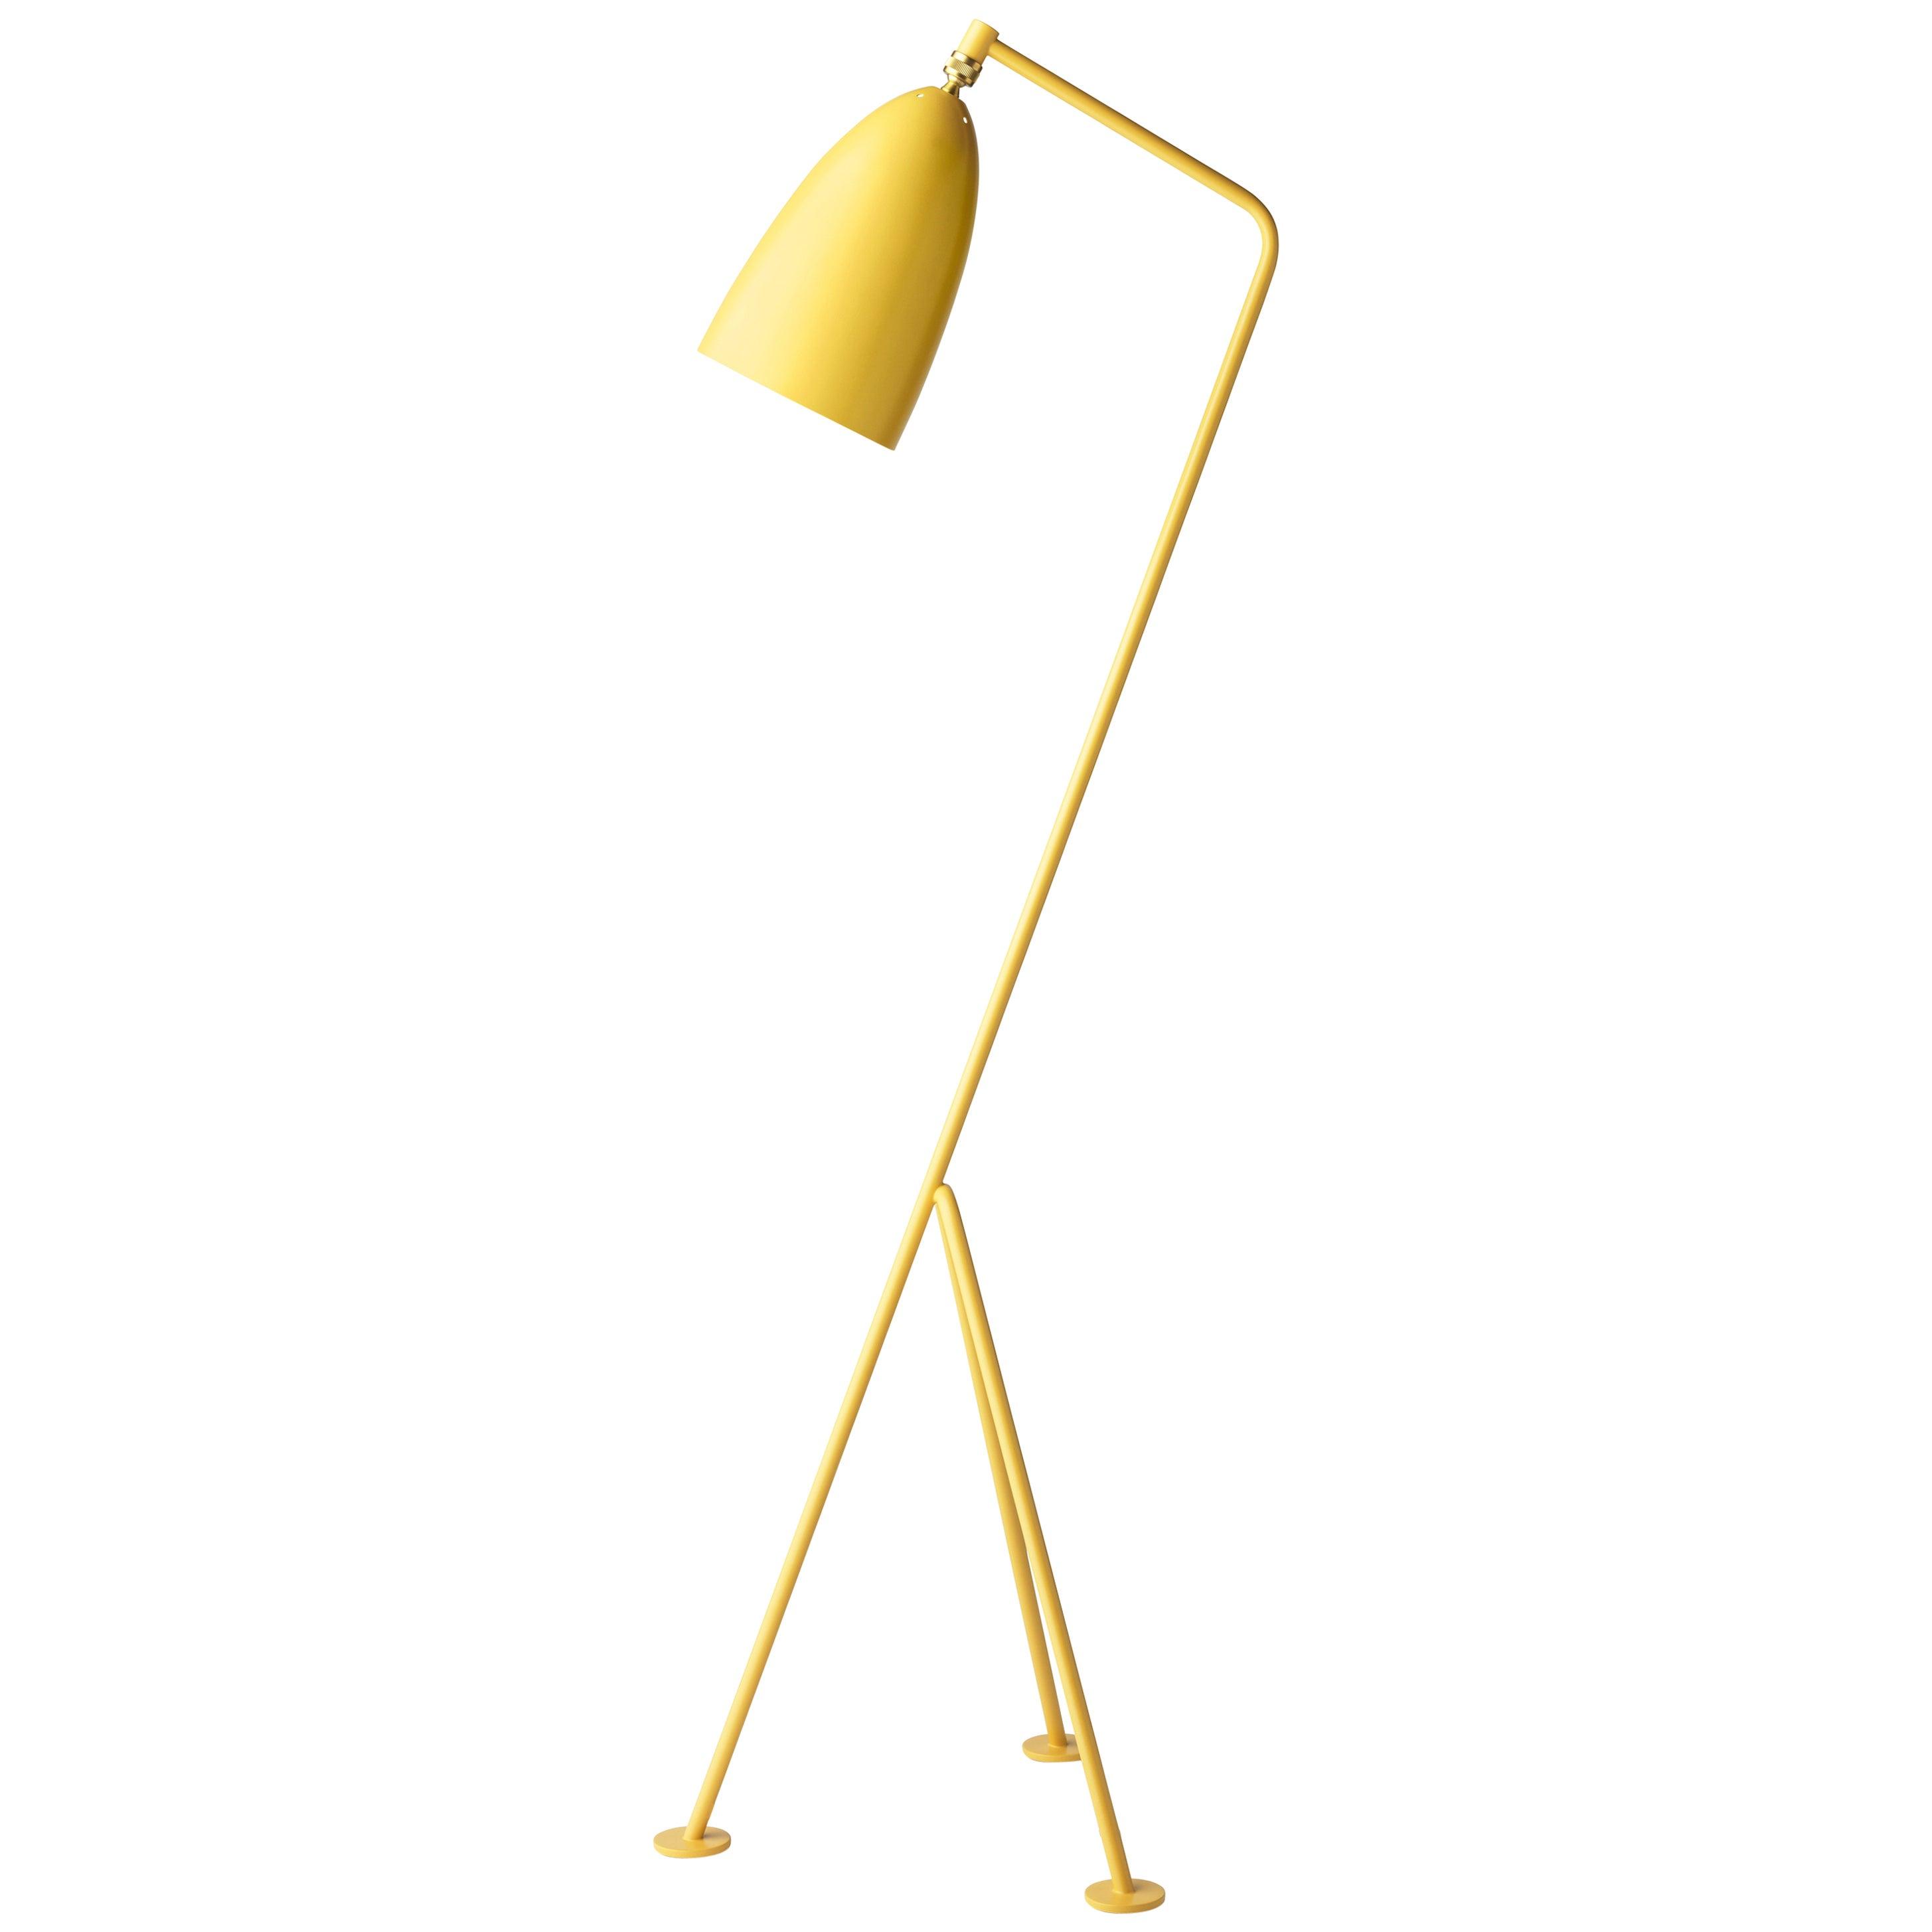 Greta Magnusson Grossman 'Grasshopper' Floor Lamp in Yellow